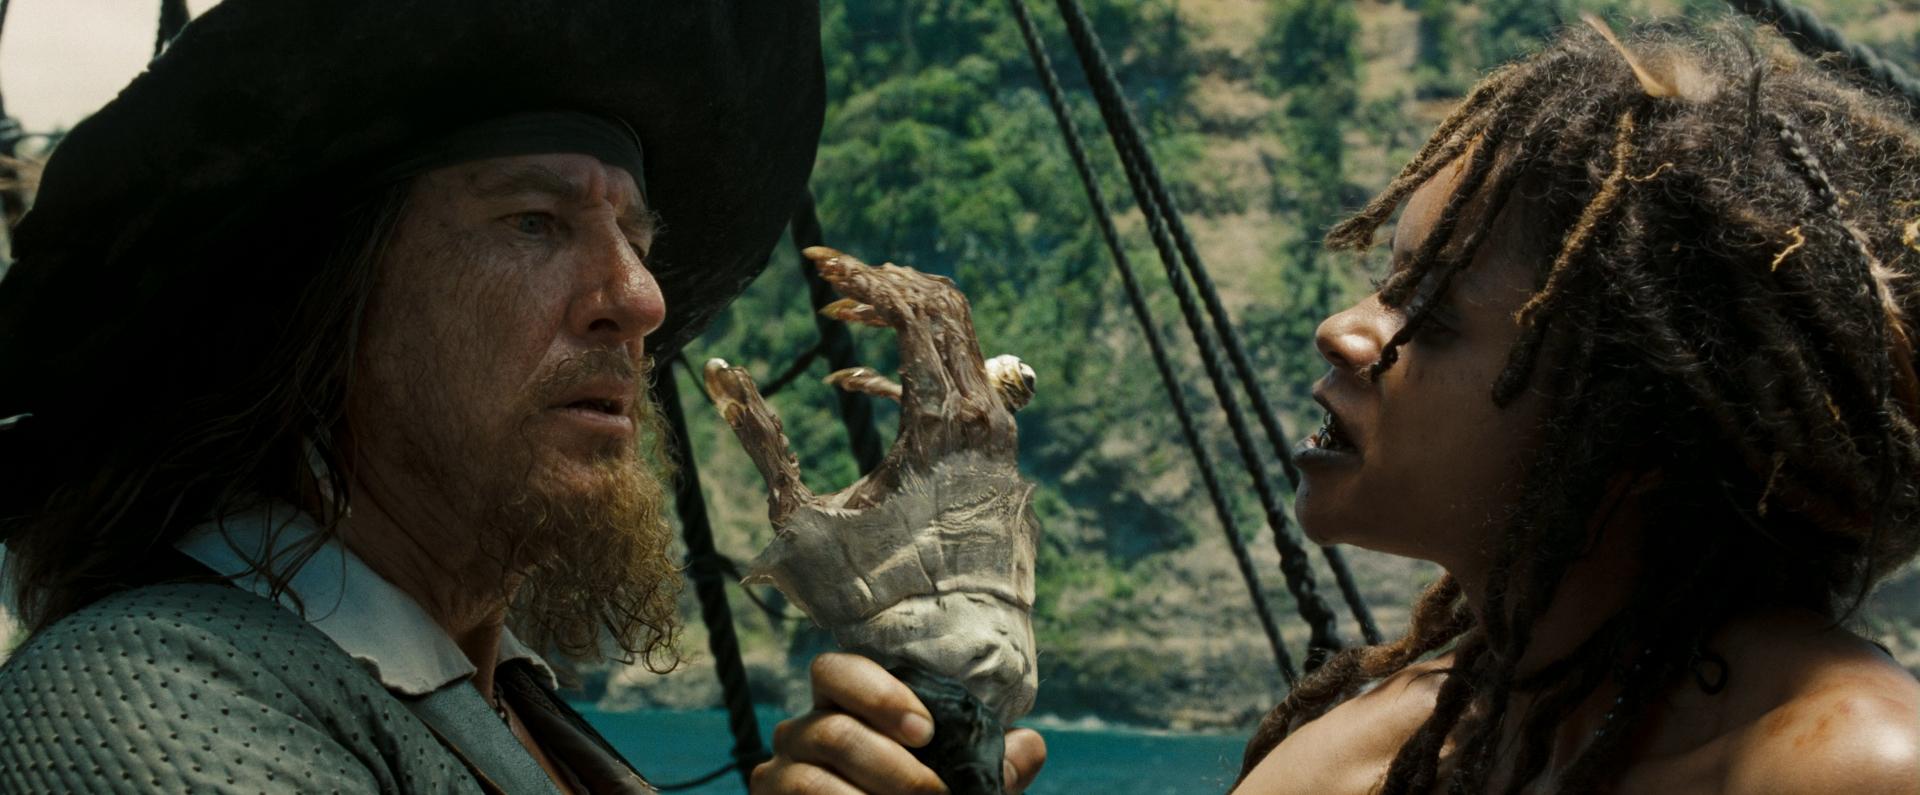 pirates of the caribbean davy jones actor